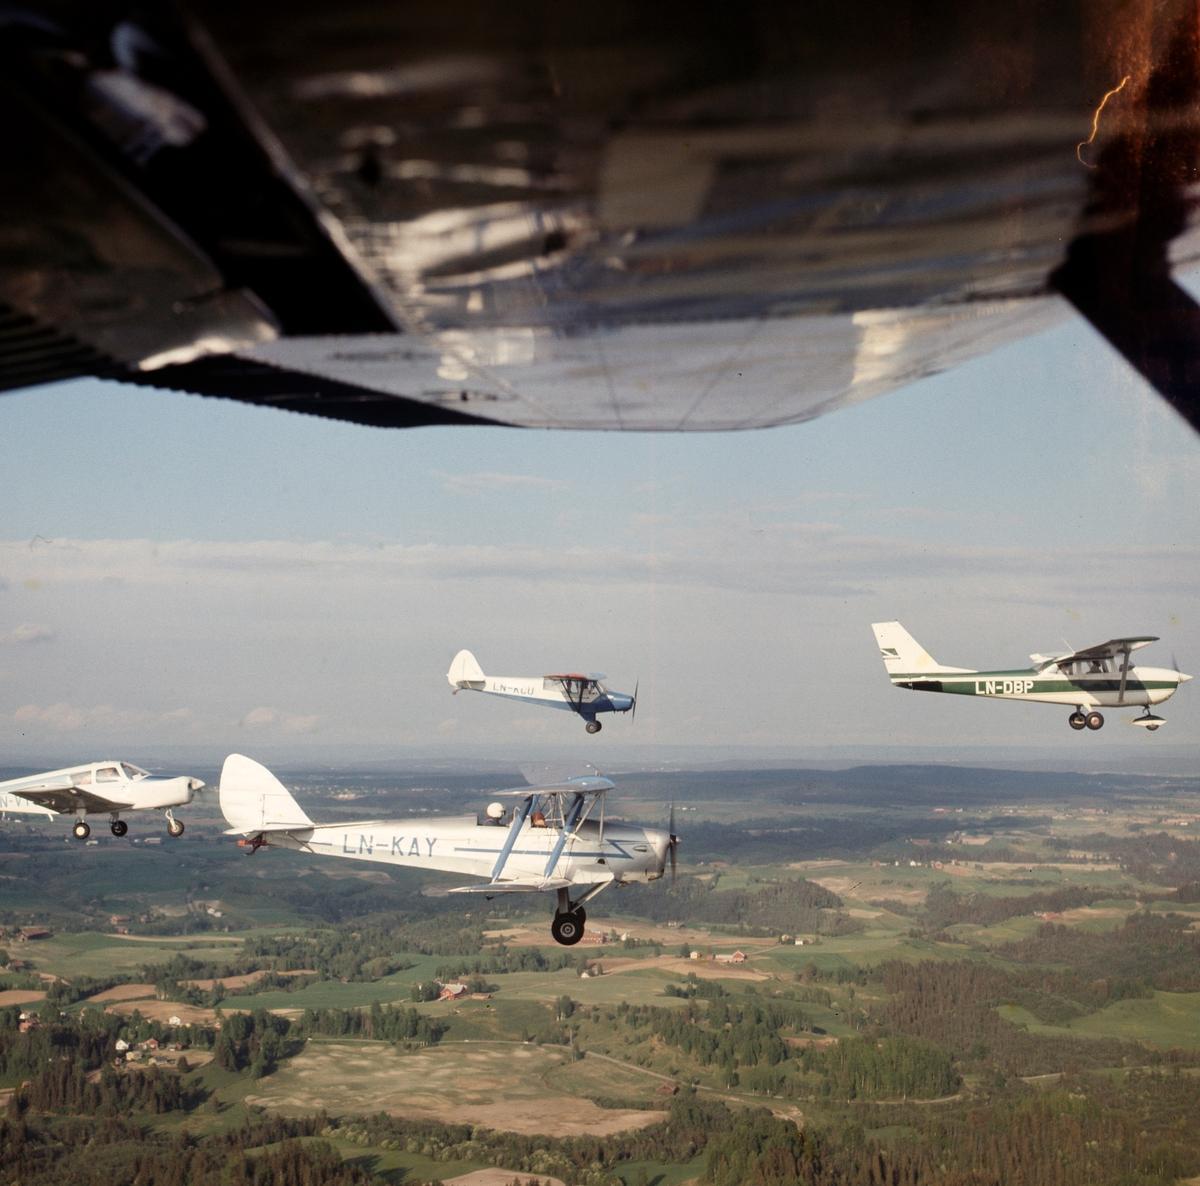 Fly i lufta, Gardermoen flyklubb. LN-KCU, LN_KAY og LN-DBP.